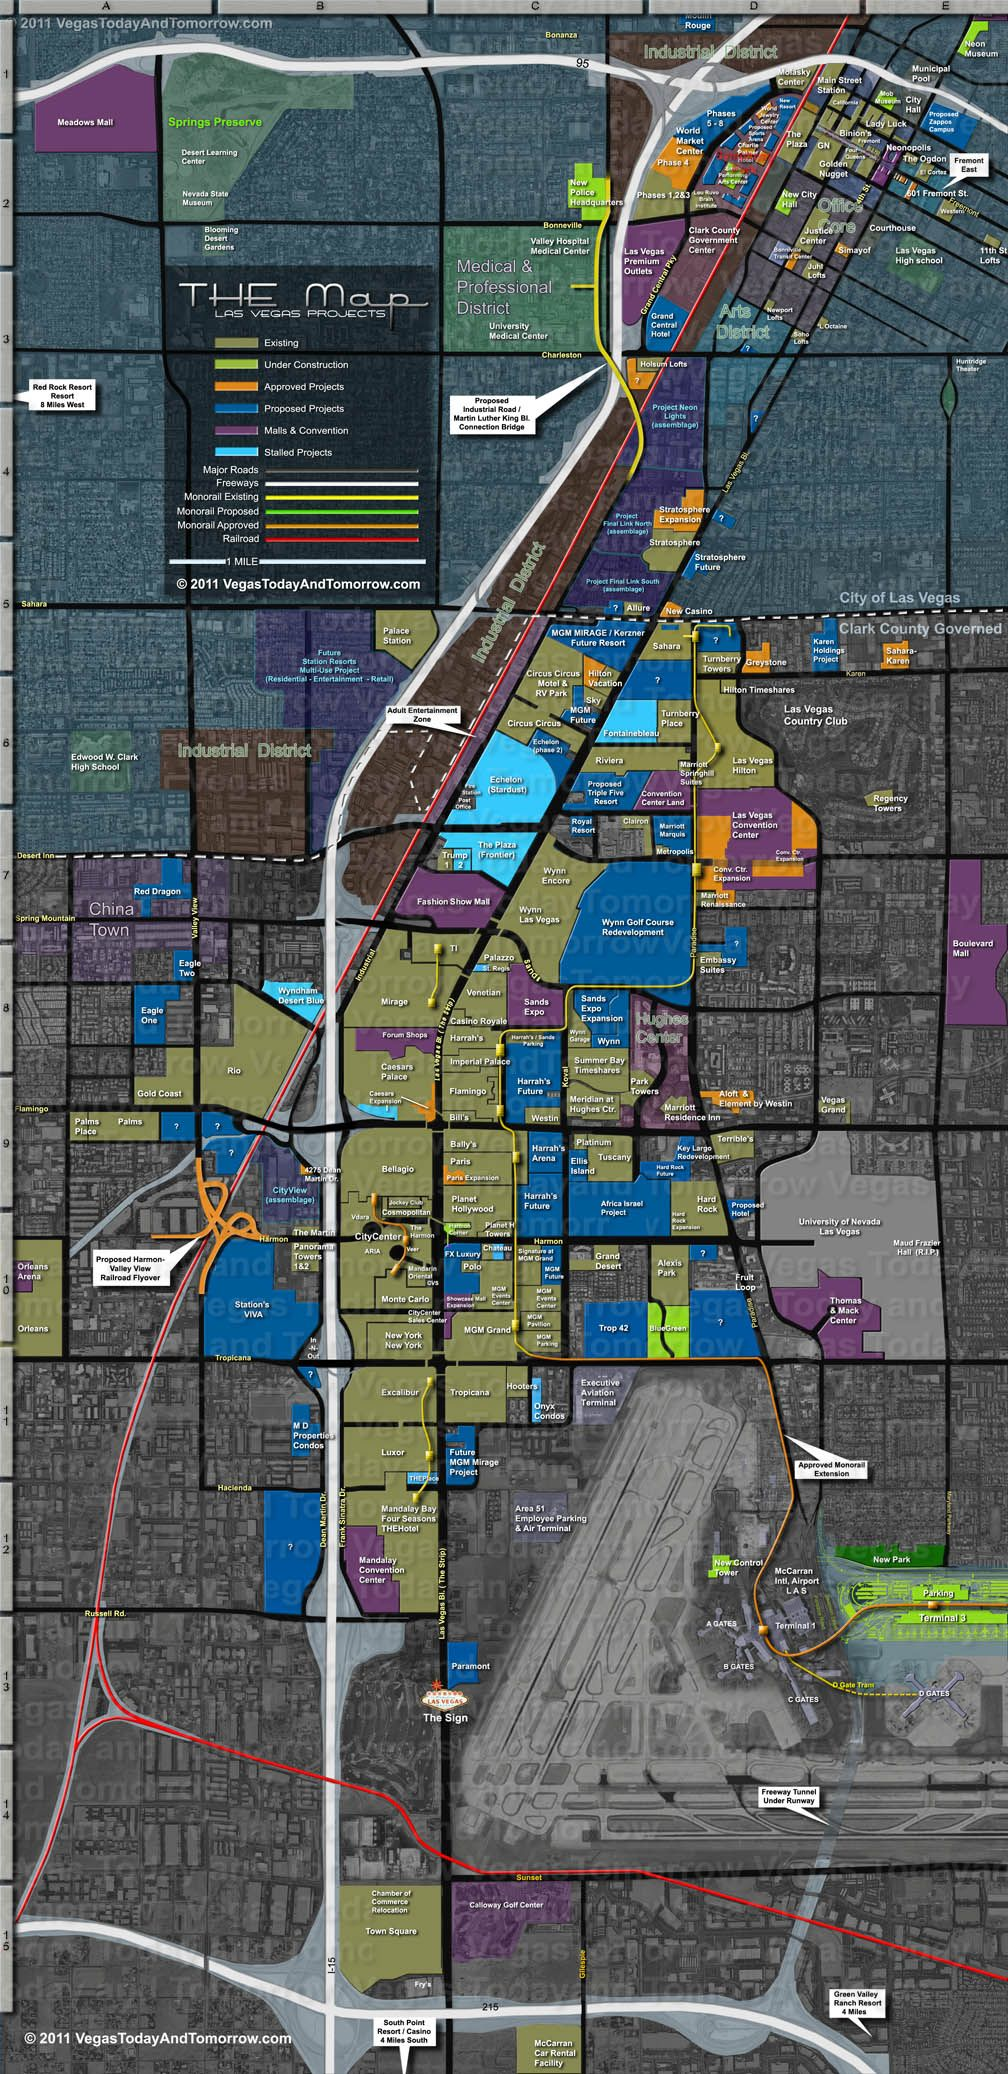 Las Vegas Map In 2019